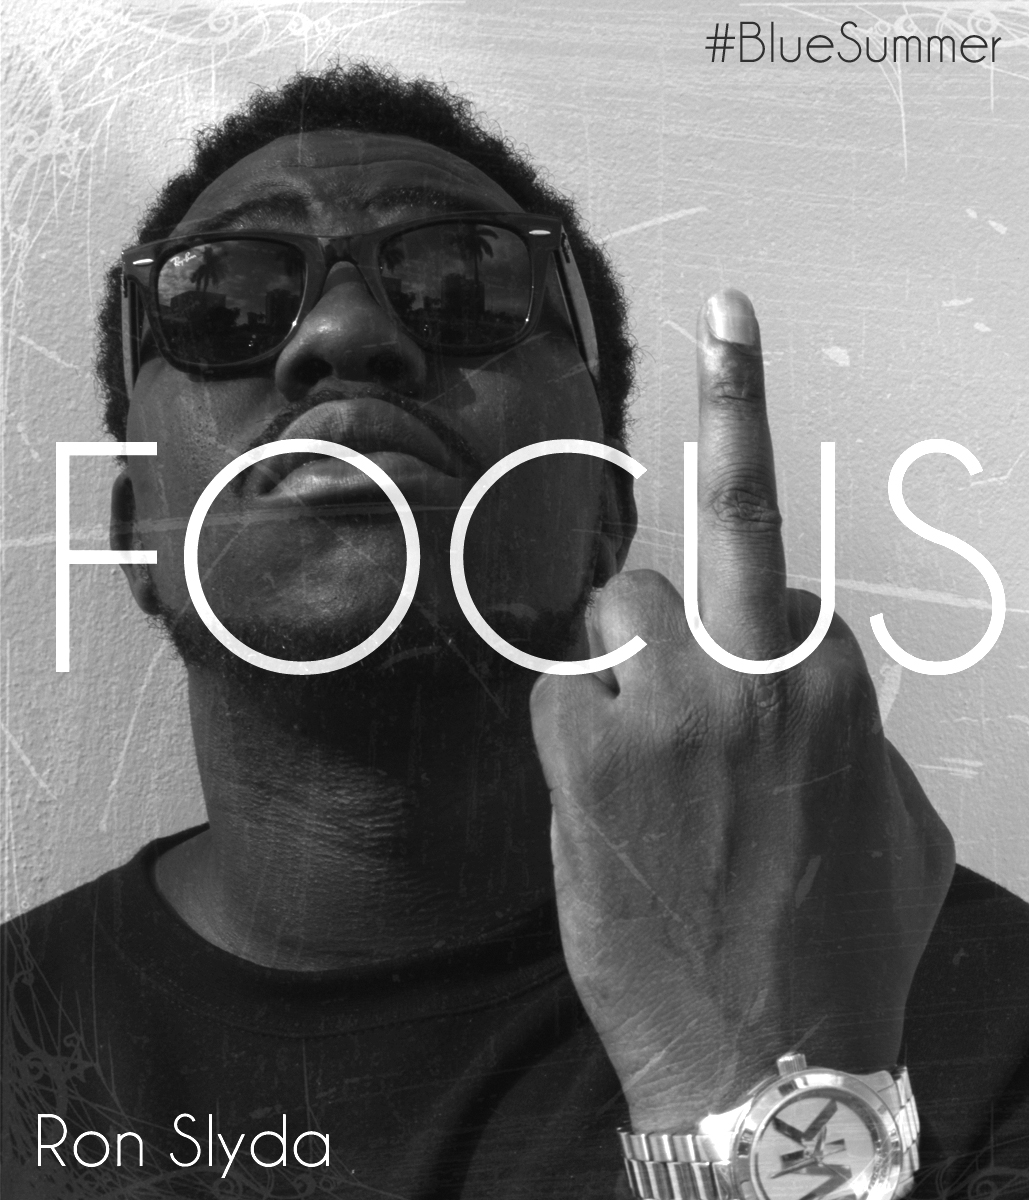 focus bluesummer